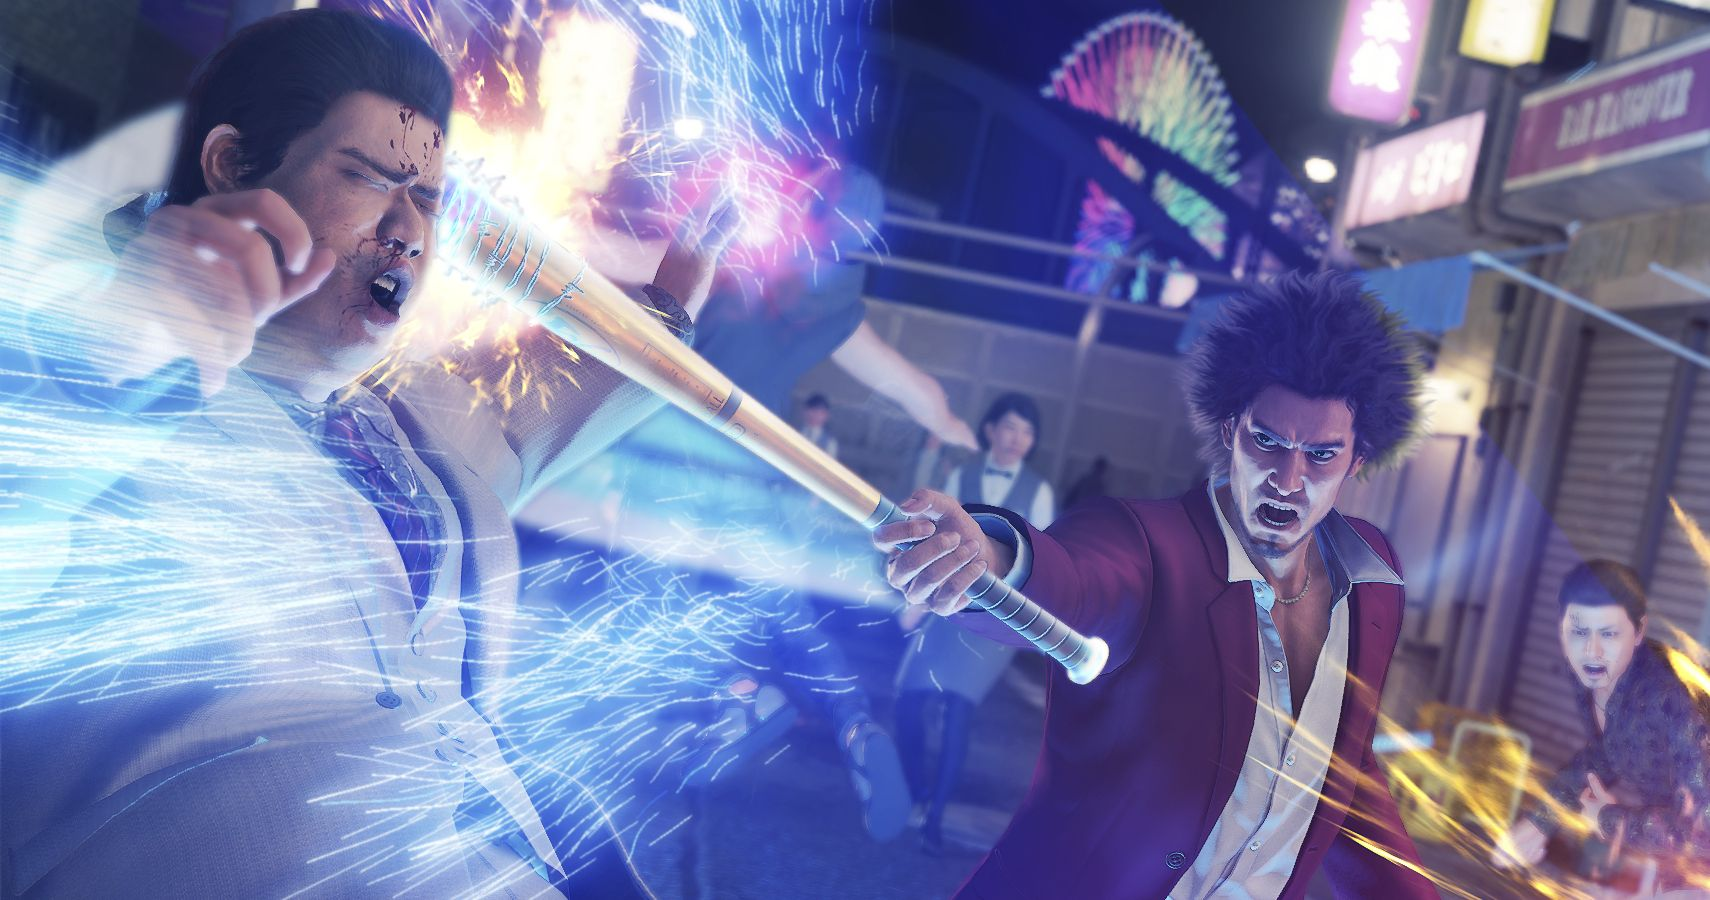 All Video Games Need The Self-Awareness Of Yakuza: Like A Dragon